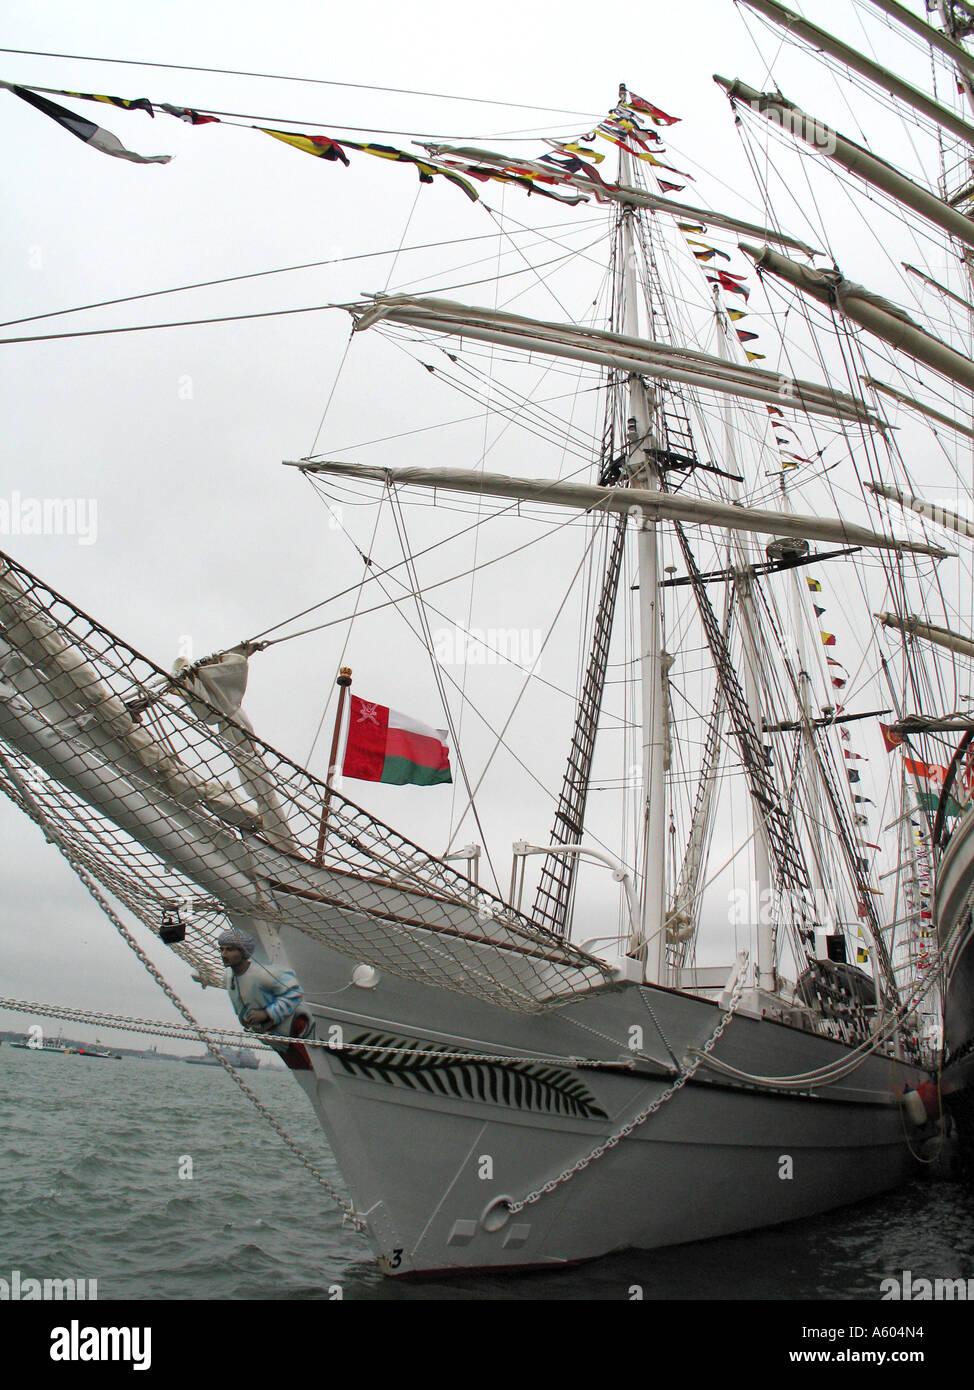 tall ship - Stock Image